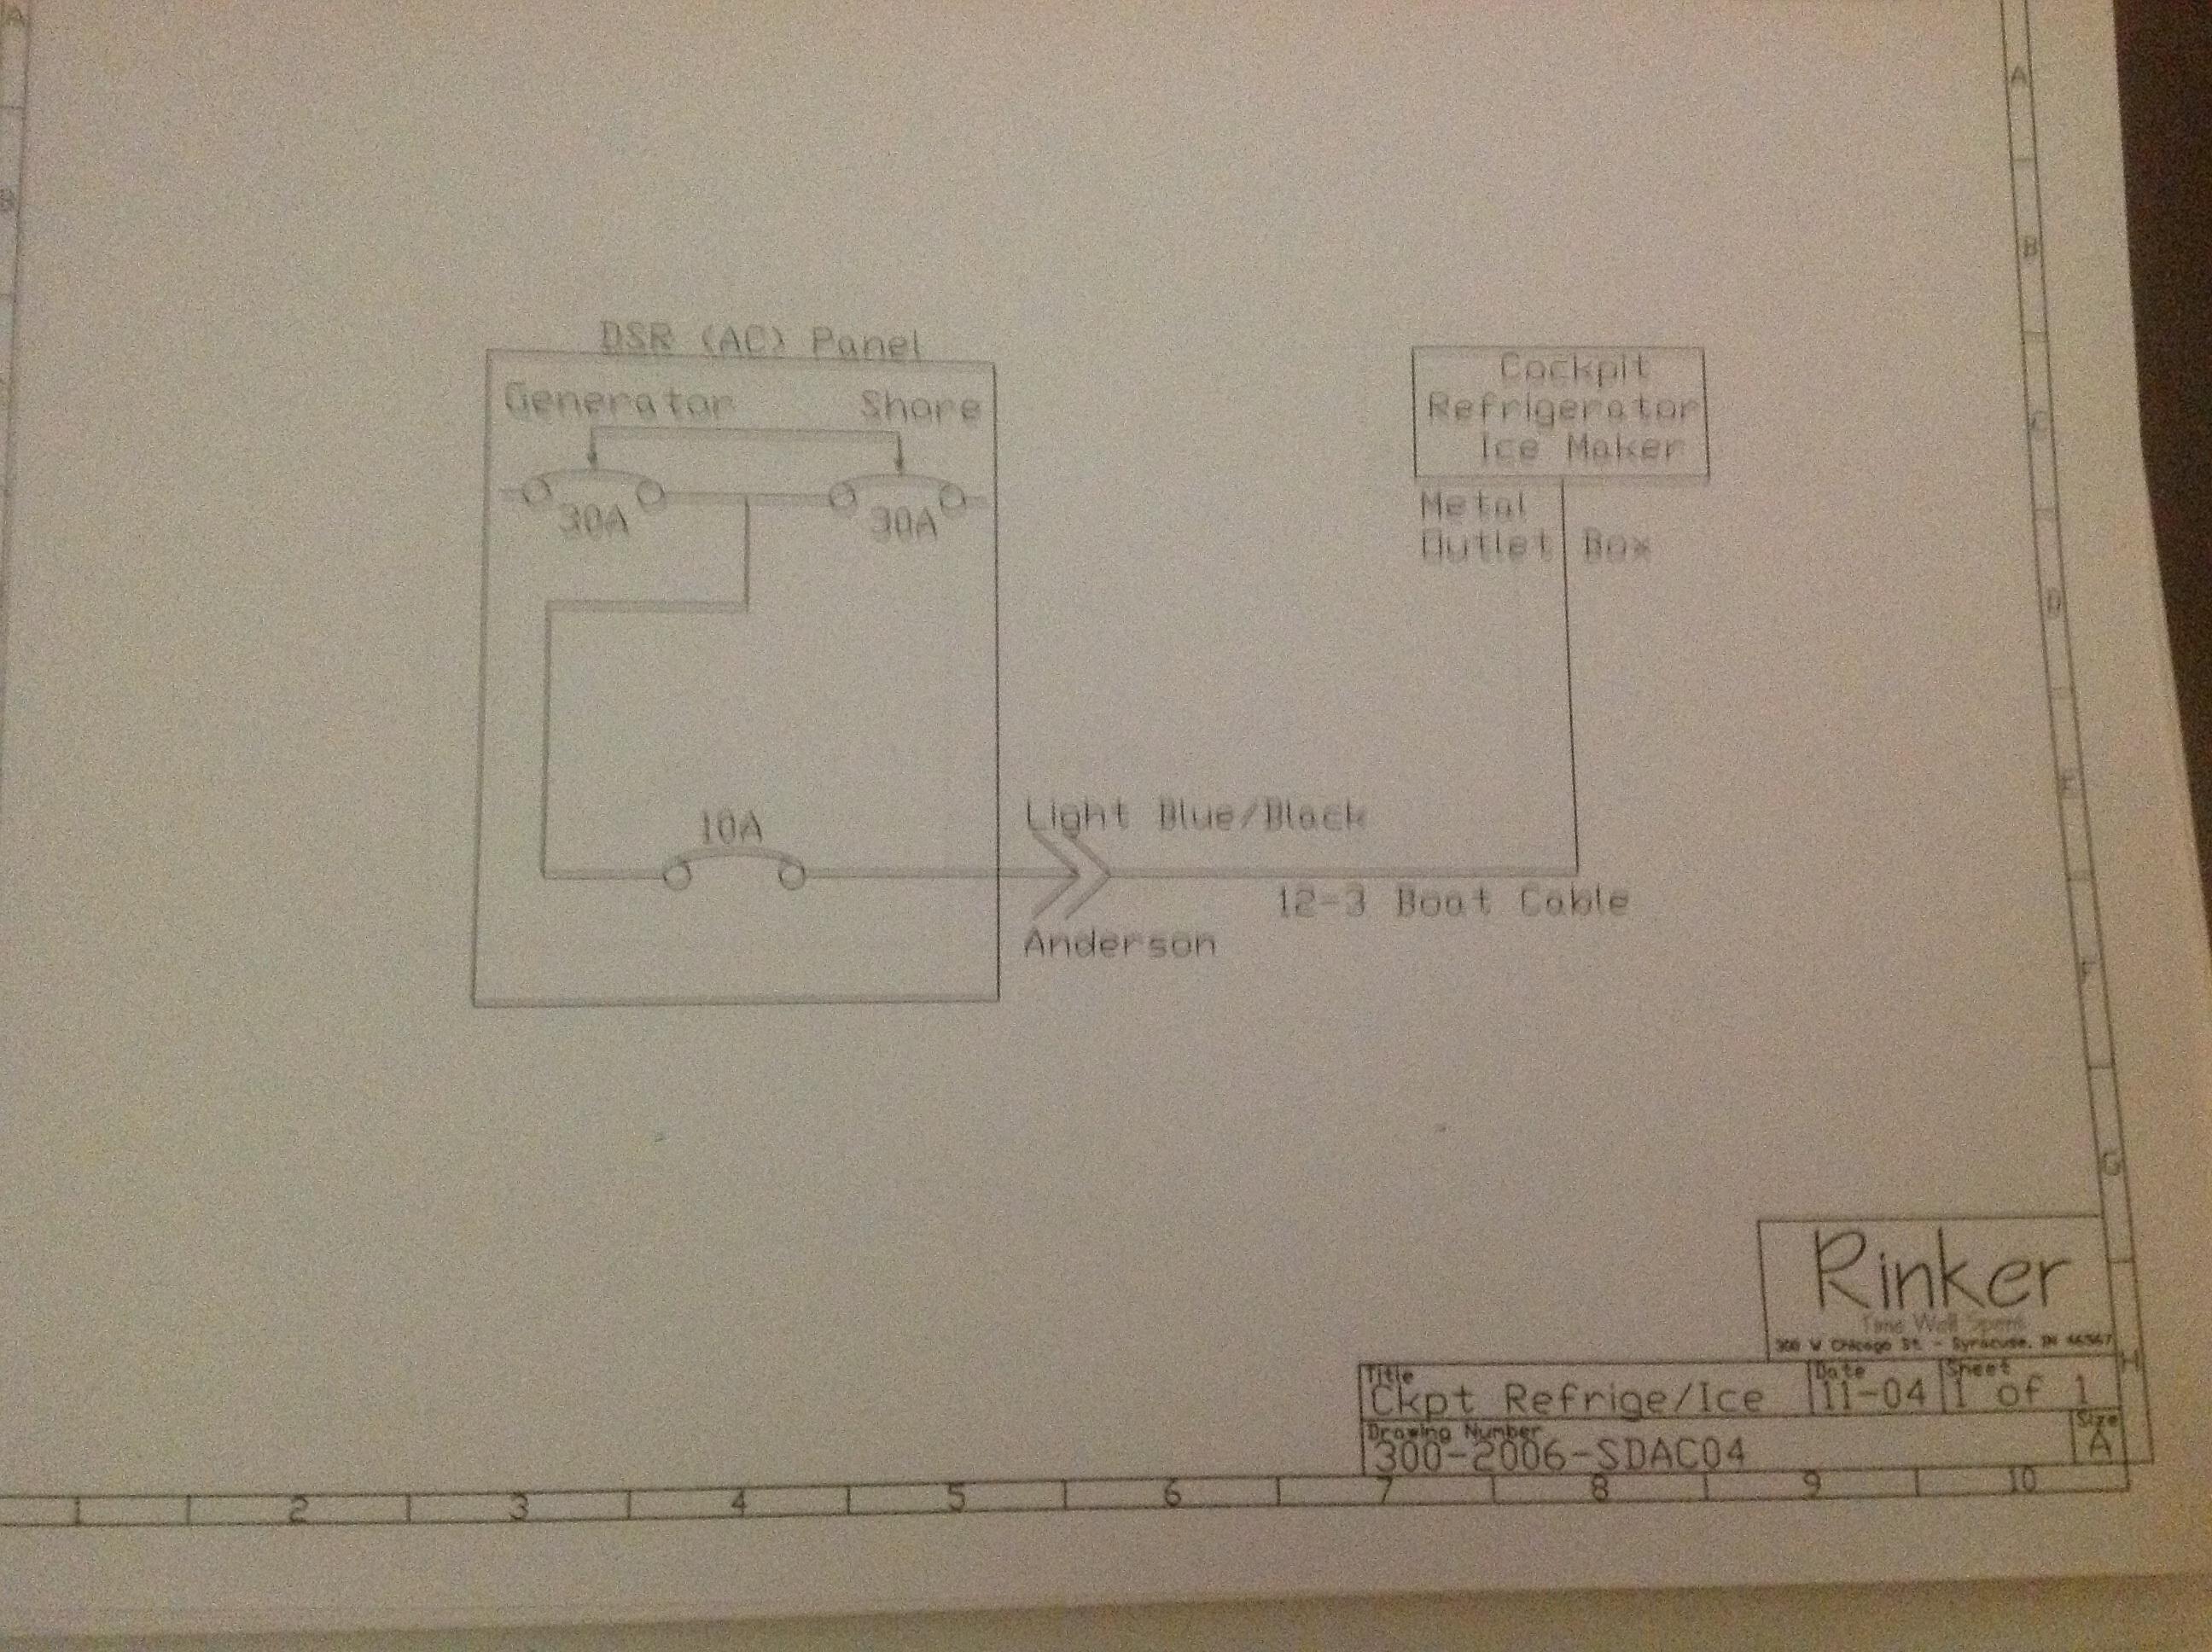 Ice Maker Wiring Harness Diagram Also Haier Refrigerator Refrigerator